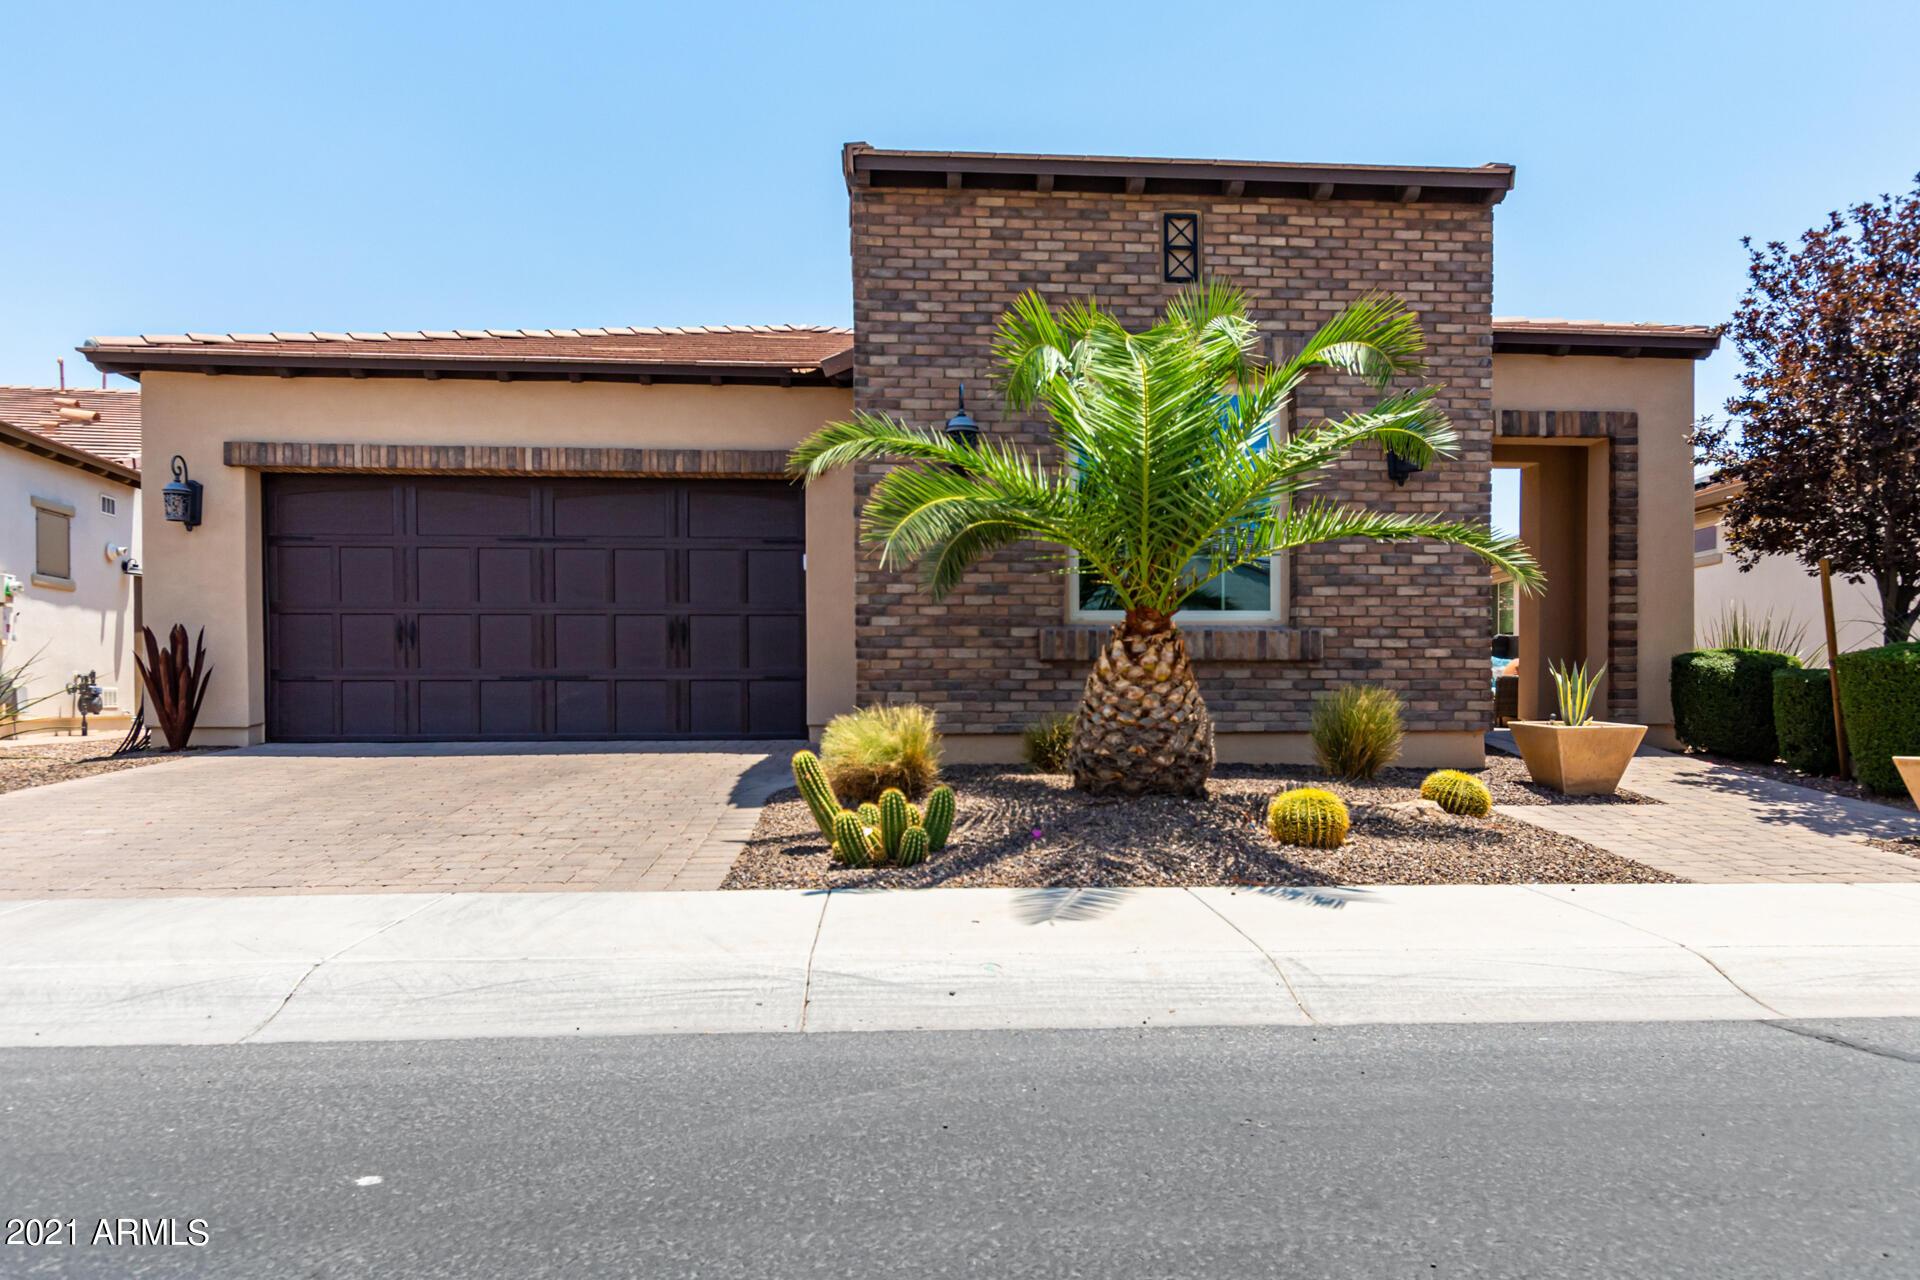 1549 VERDE Boulevard, San Tan Valley, Arizona 85140, 2 Bedrooms Bedrooms, ,2.5 BathroomsBathrooms,Residential,For Sale,VERDE,6253233